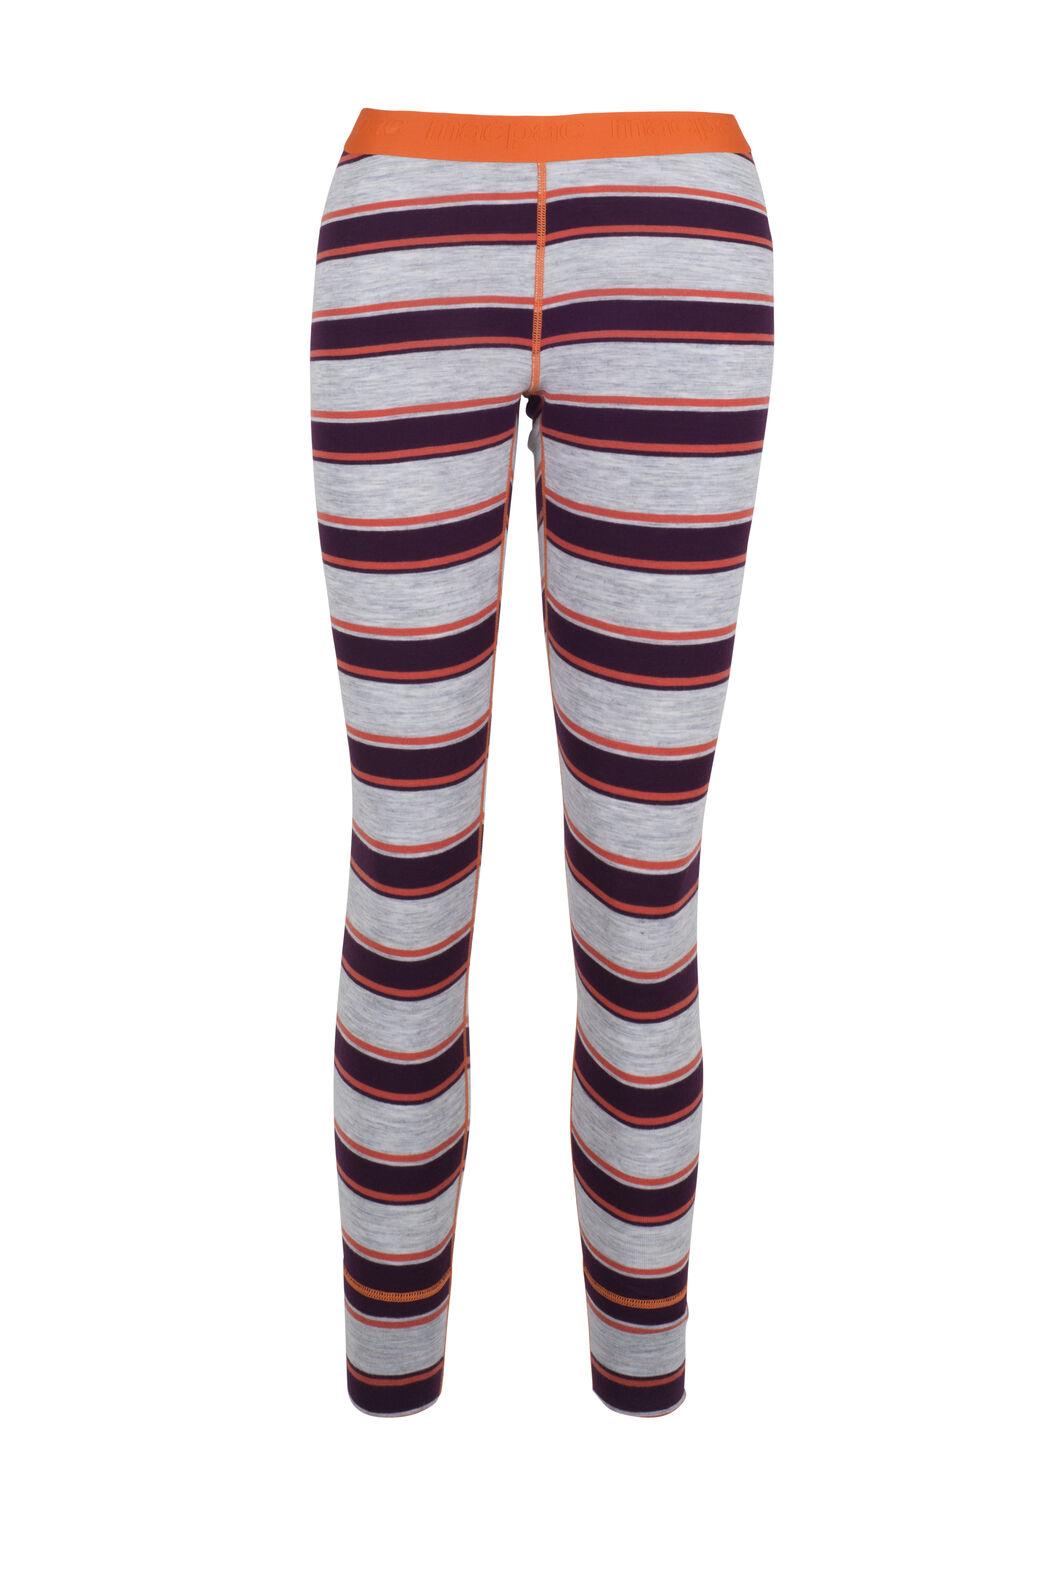 Macpac 220 Merino Long Johns — Women's, Purple Stripe, hi-res